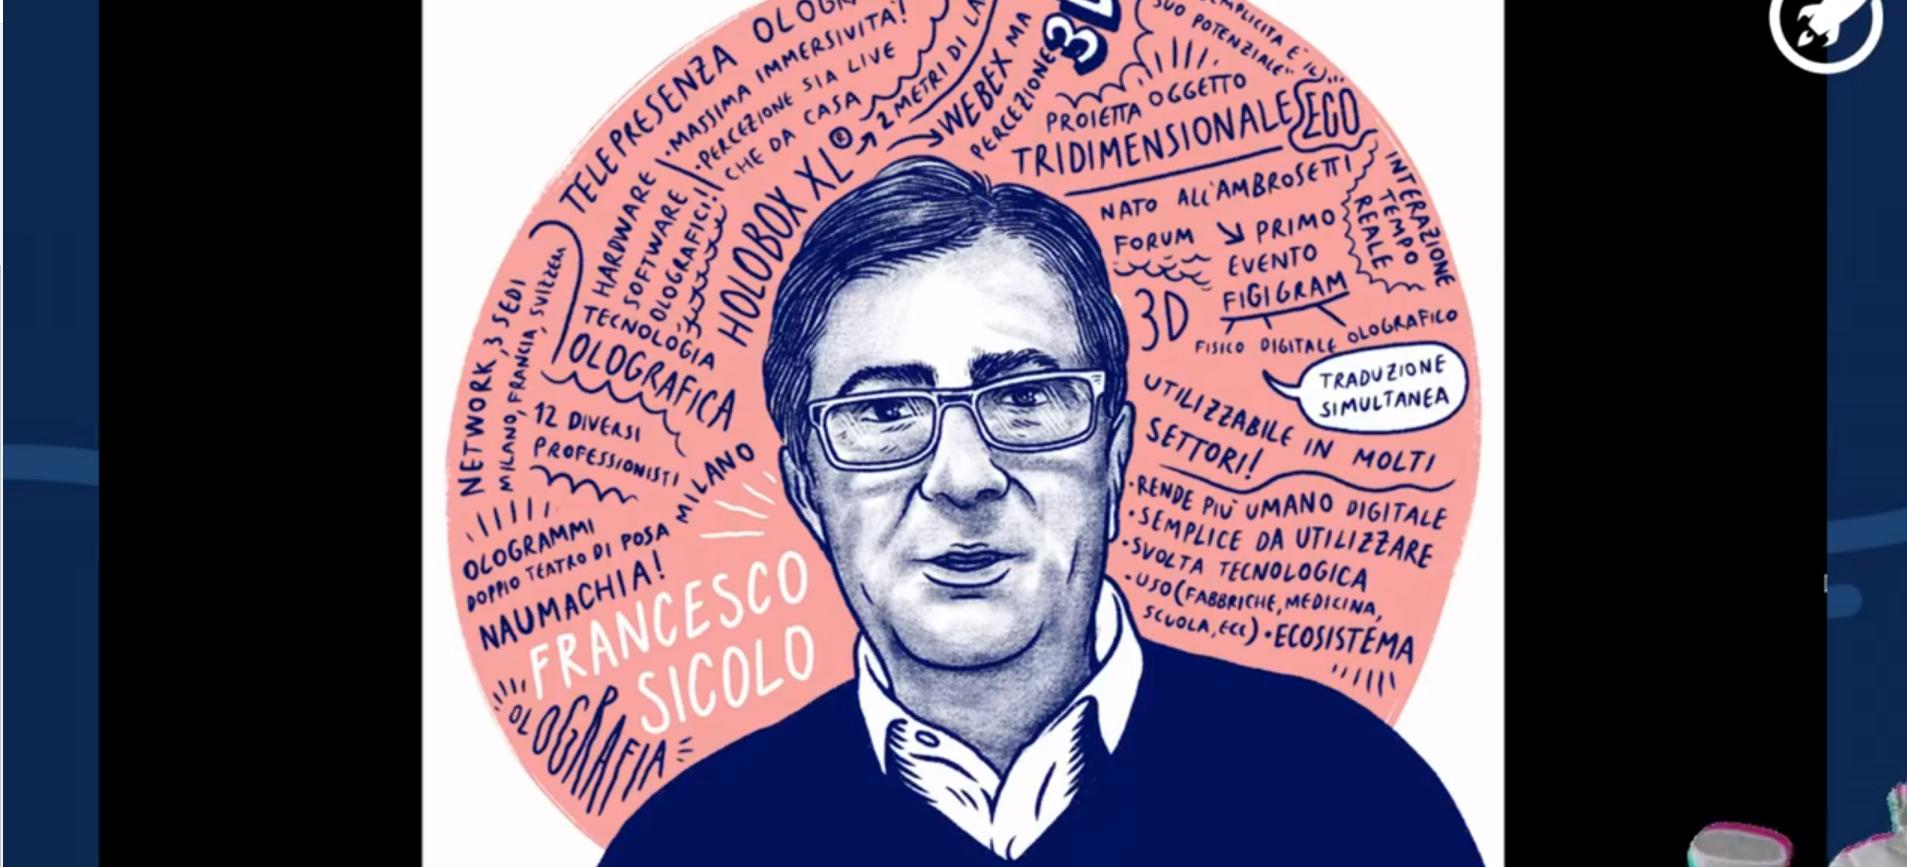 Naumachia dice la sua al Workshop StartupItalia Open Summit 2020